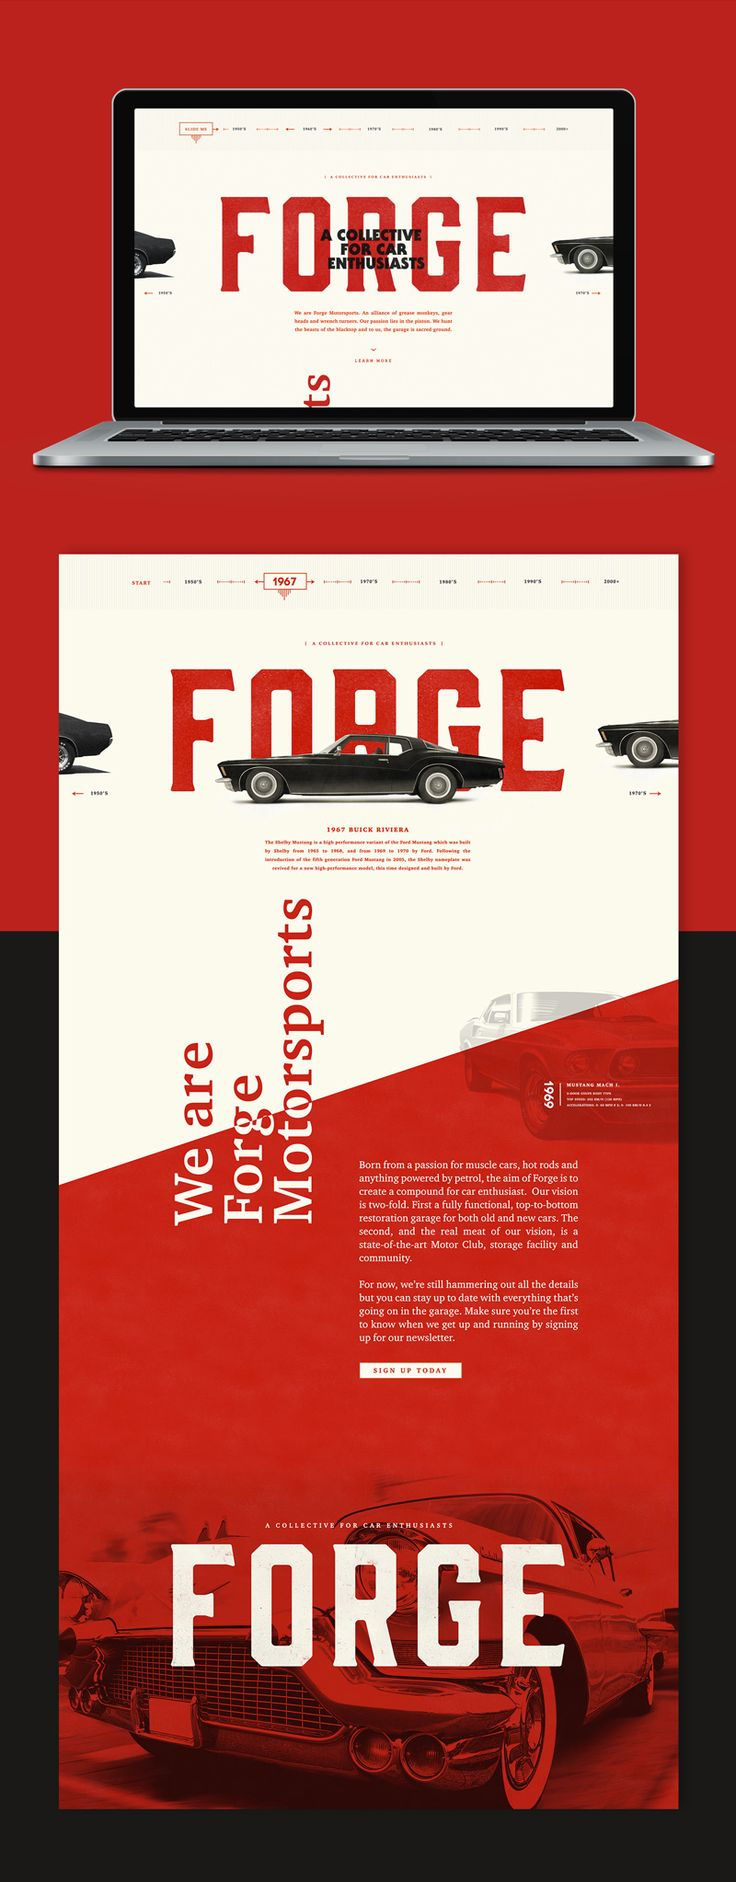 2054 best Web Design / UI images on Pinterest | Motion graphics, Ui ...